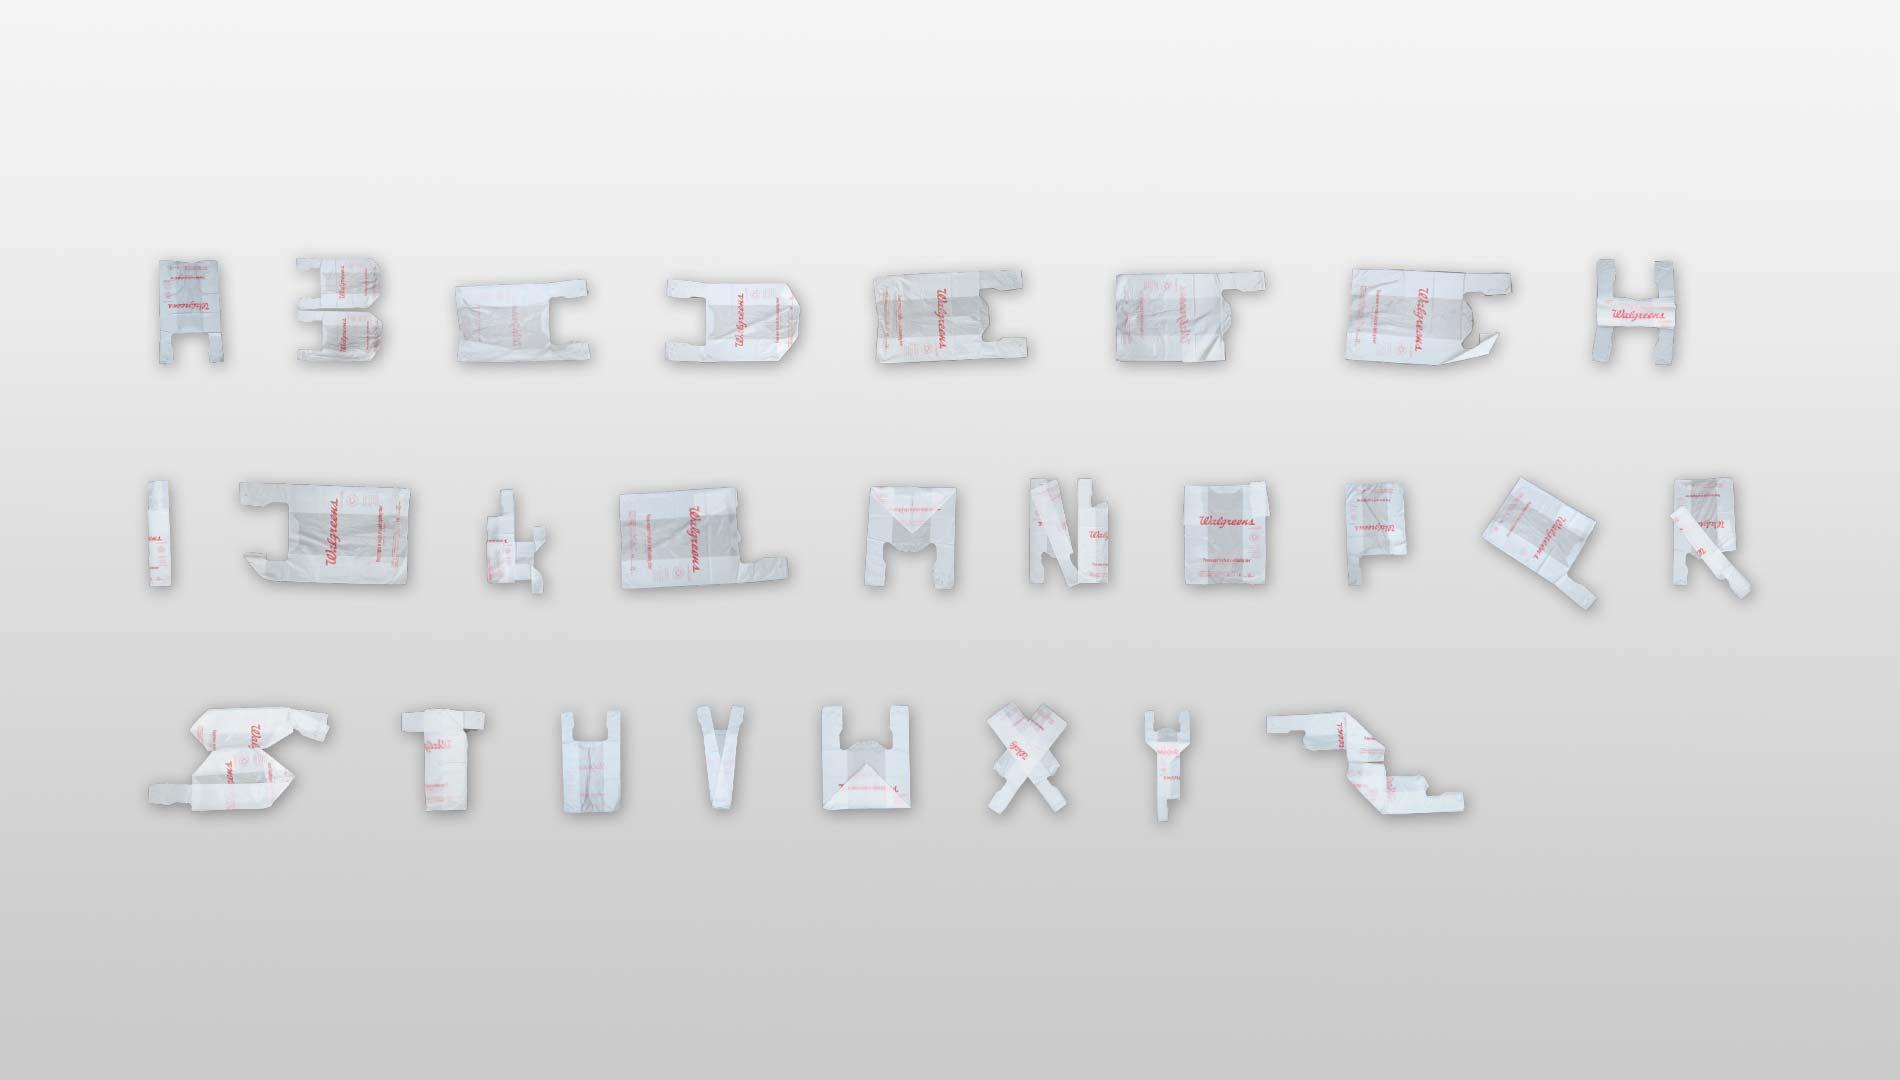 danielle_newman_typeface_9